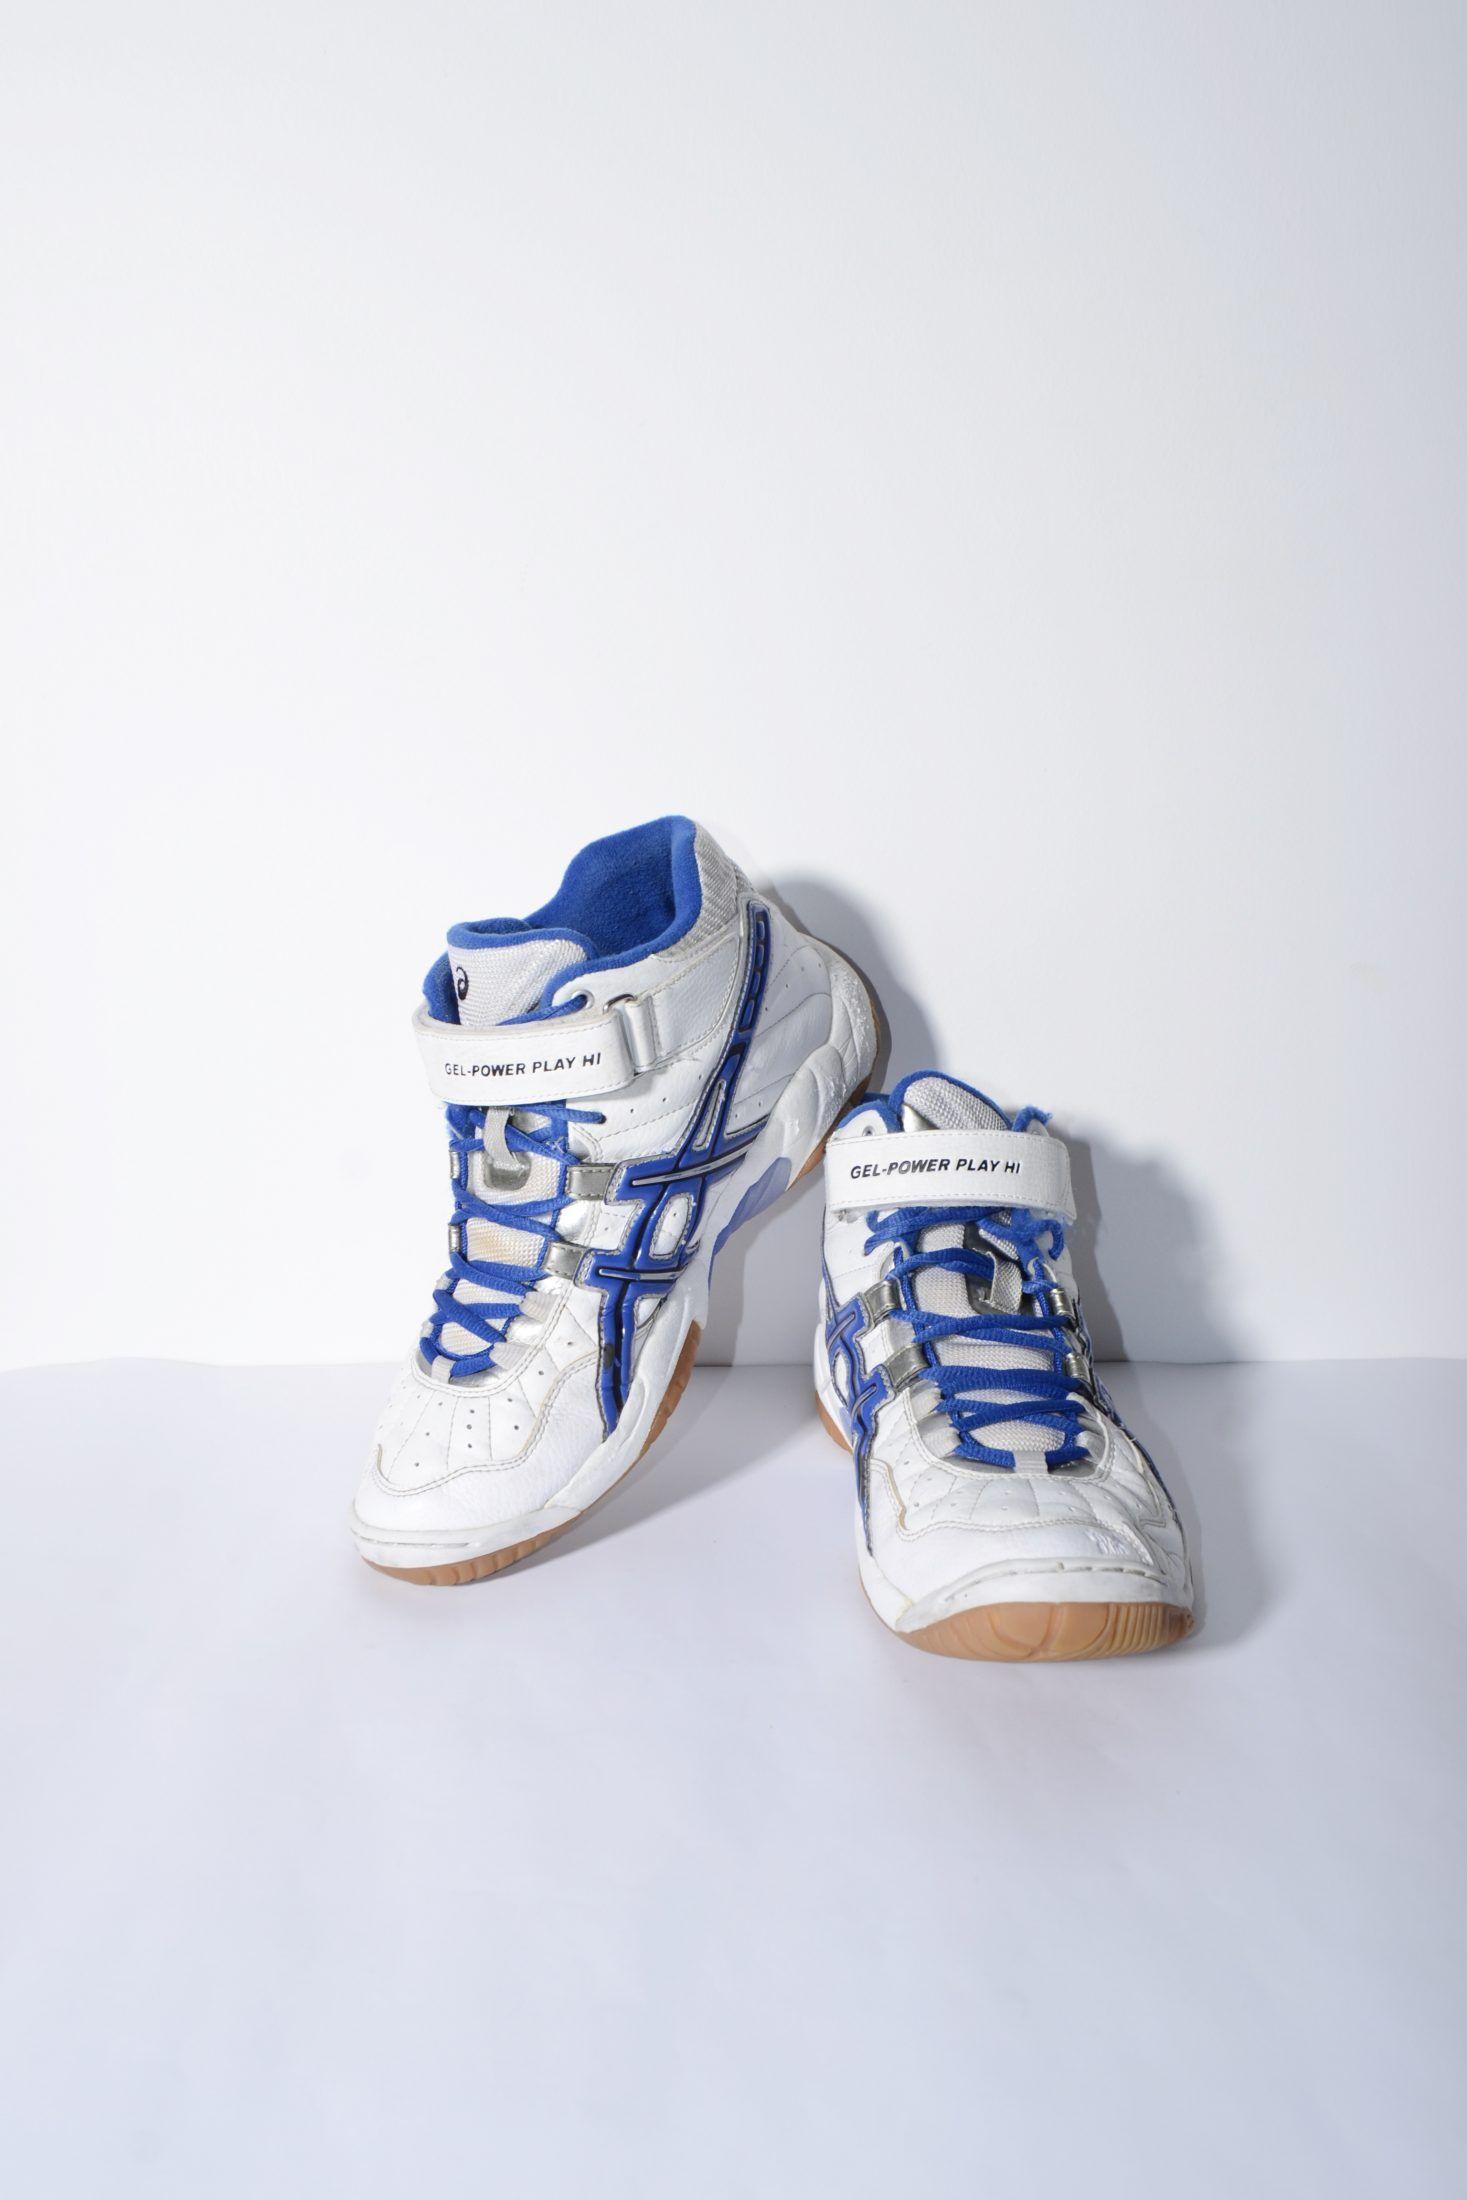 Asics Old School sneaker   Mens high top   Sport shoes men, White ...